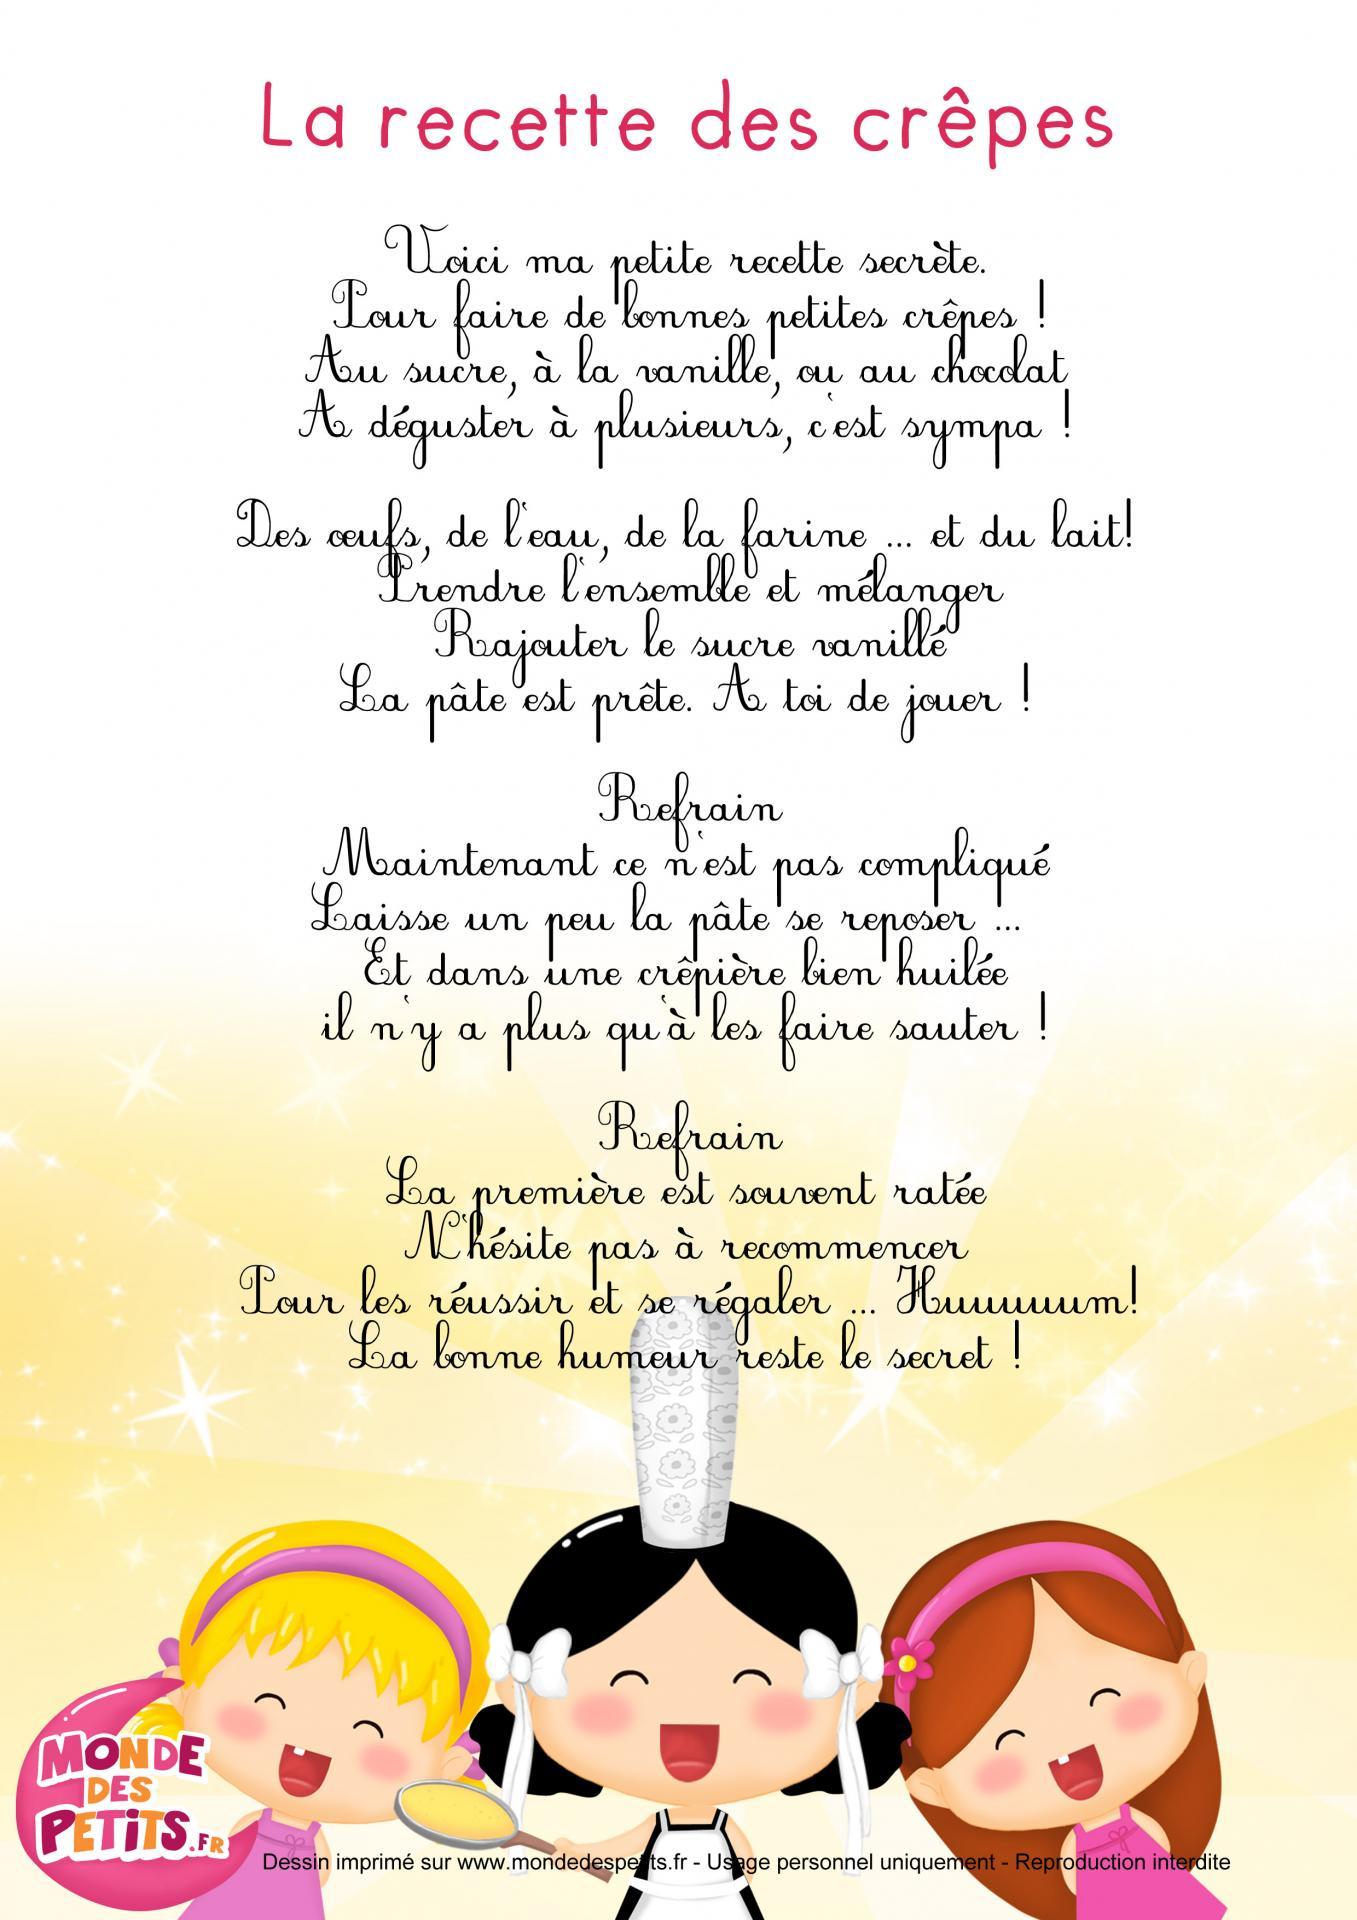 Comptine crepe chandeleur, assistante maternelle Villeparisis, blog